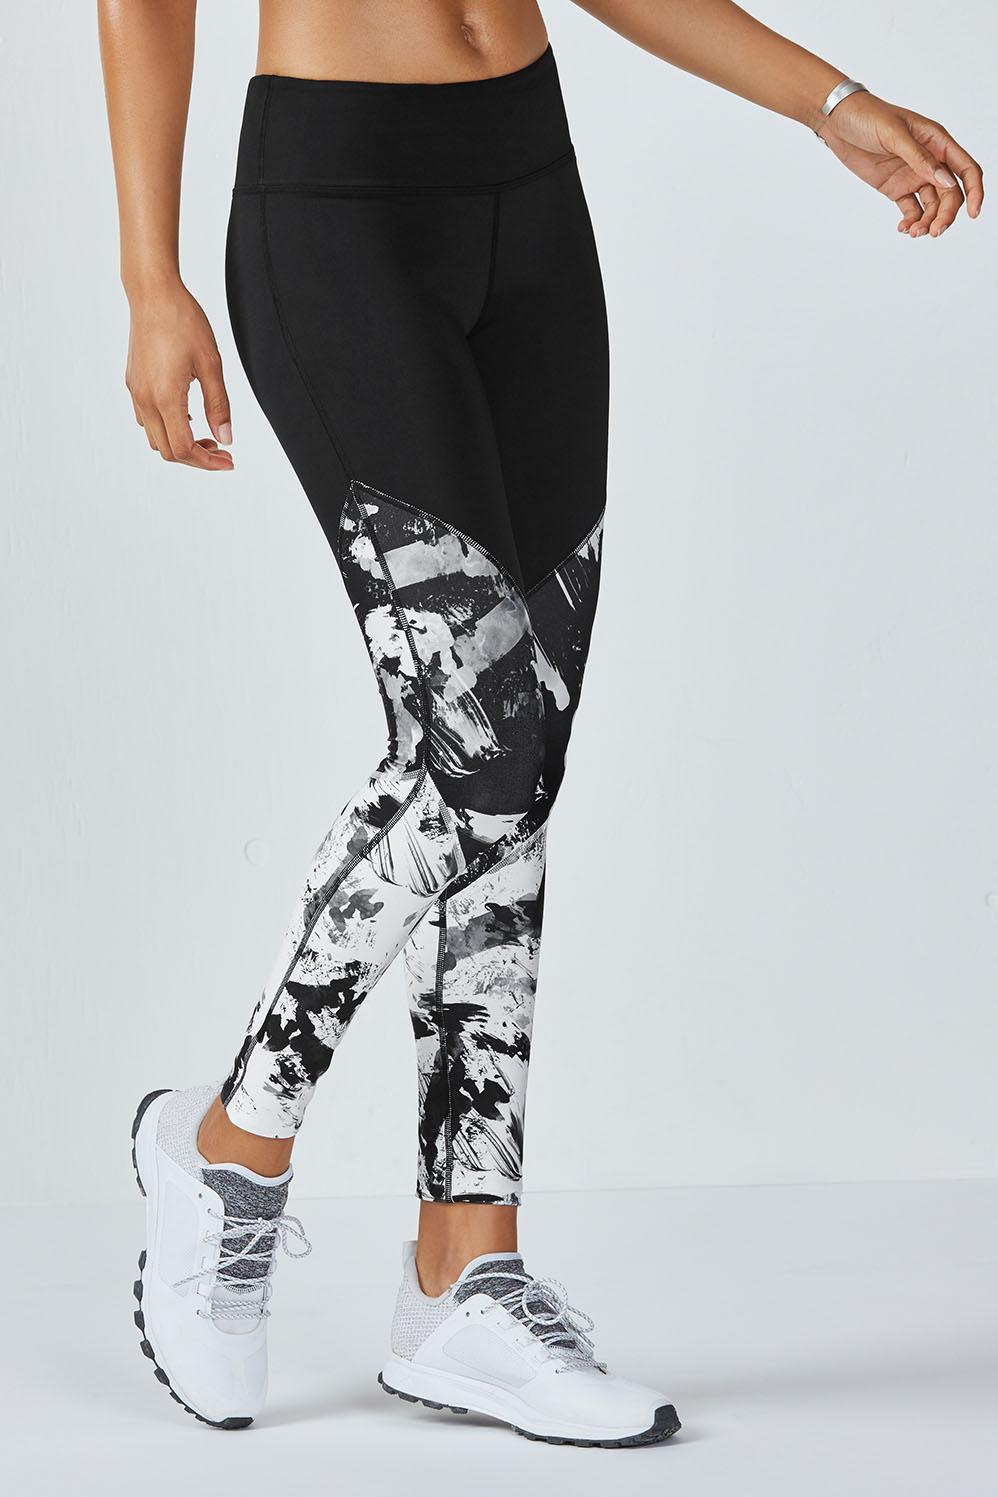 9bf1d1a148d10d Salar Statement PowerHold® Legging - Black/Black Fresco Print/White Fresco  Print